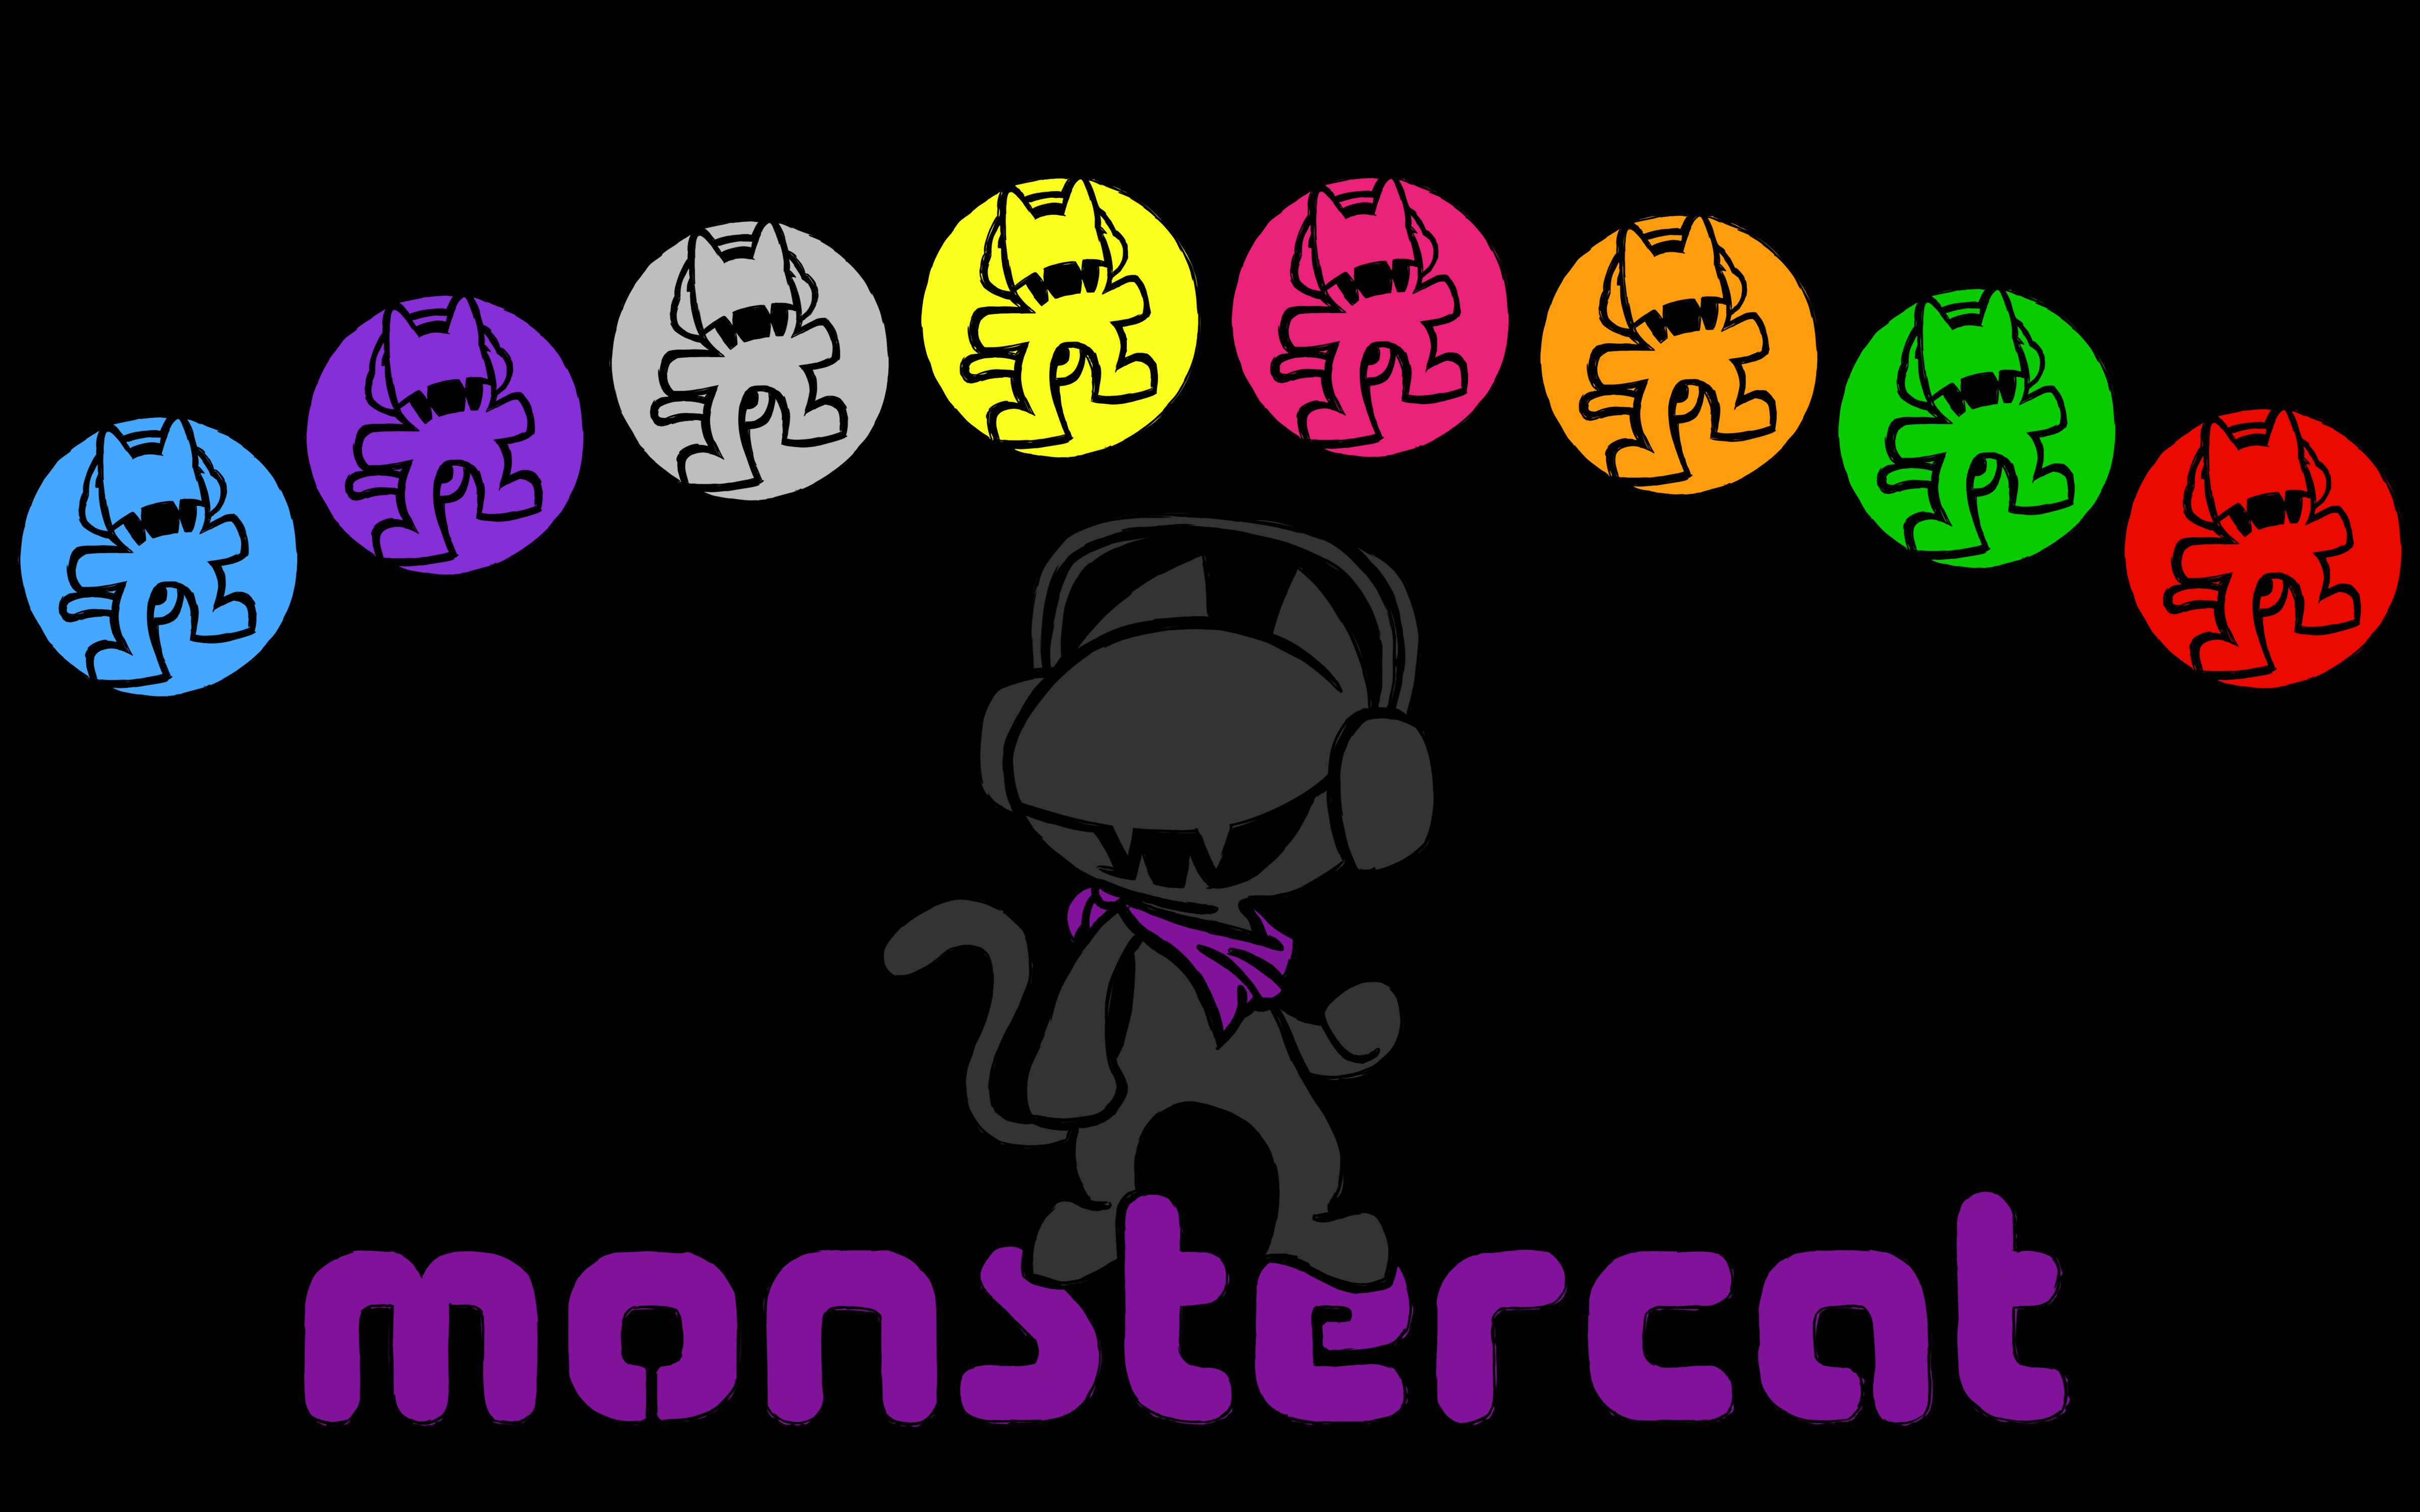 Monstercat Media: Pick Your Flavor wallpaper by RUROKENROX on DeviantArt